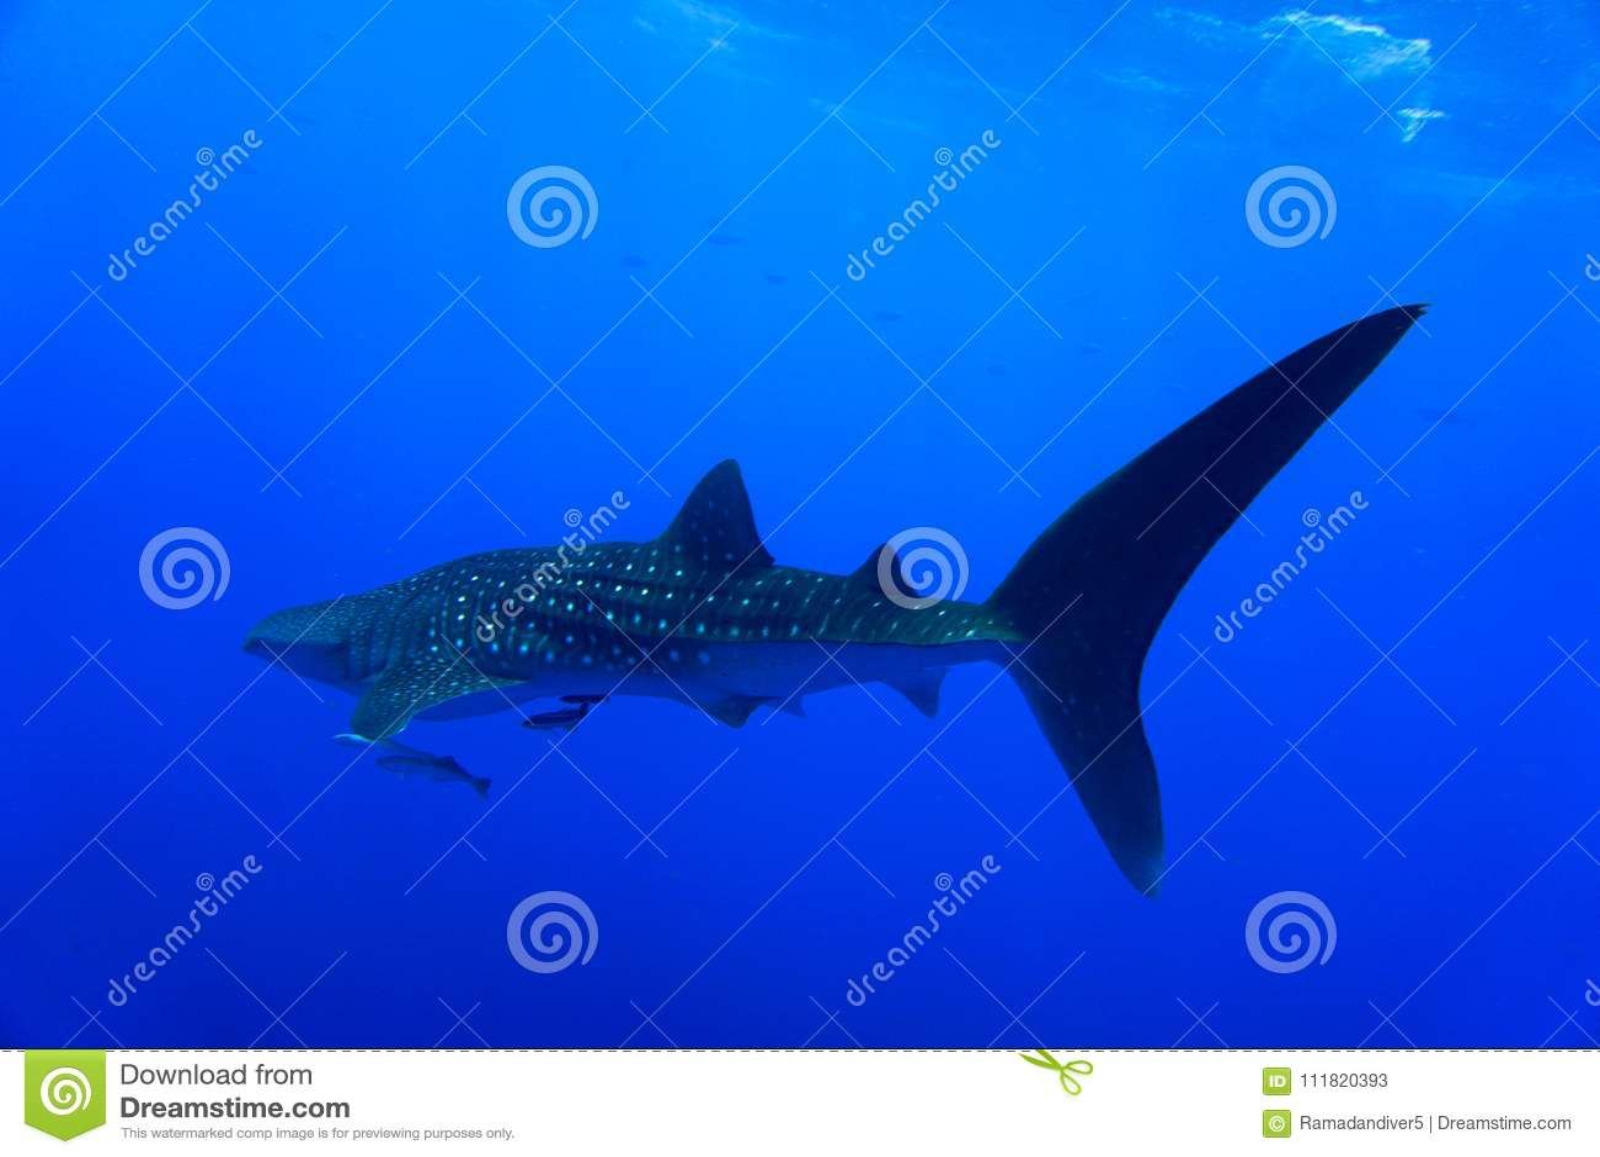 Whale Shark Red Sea